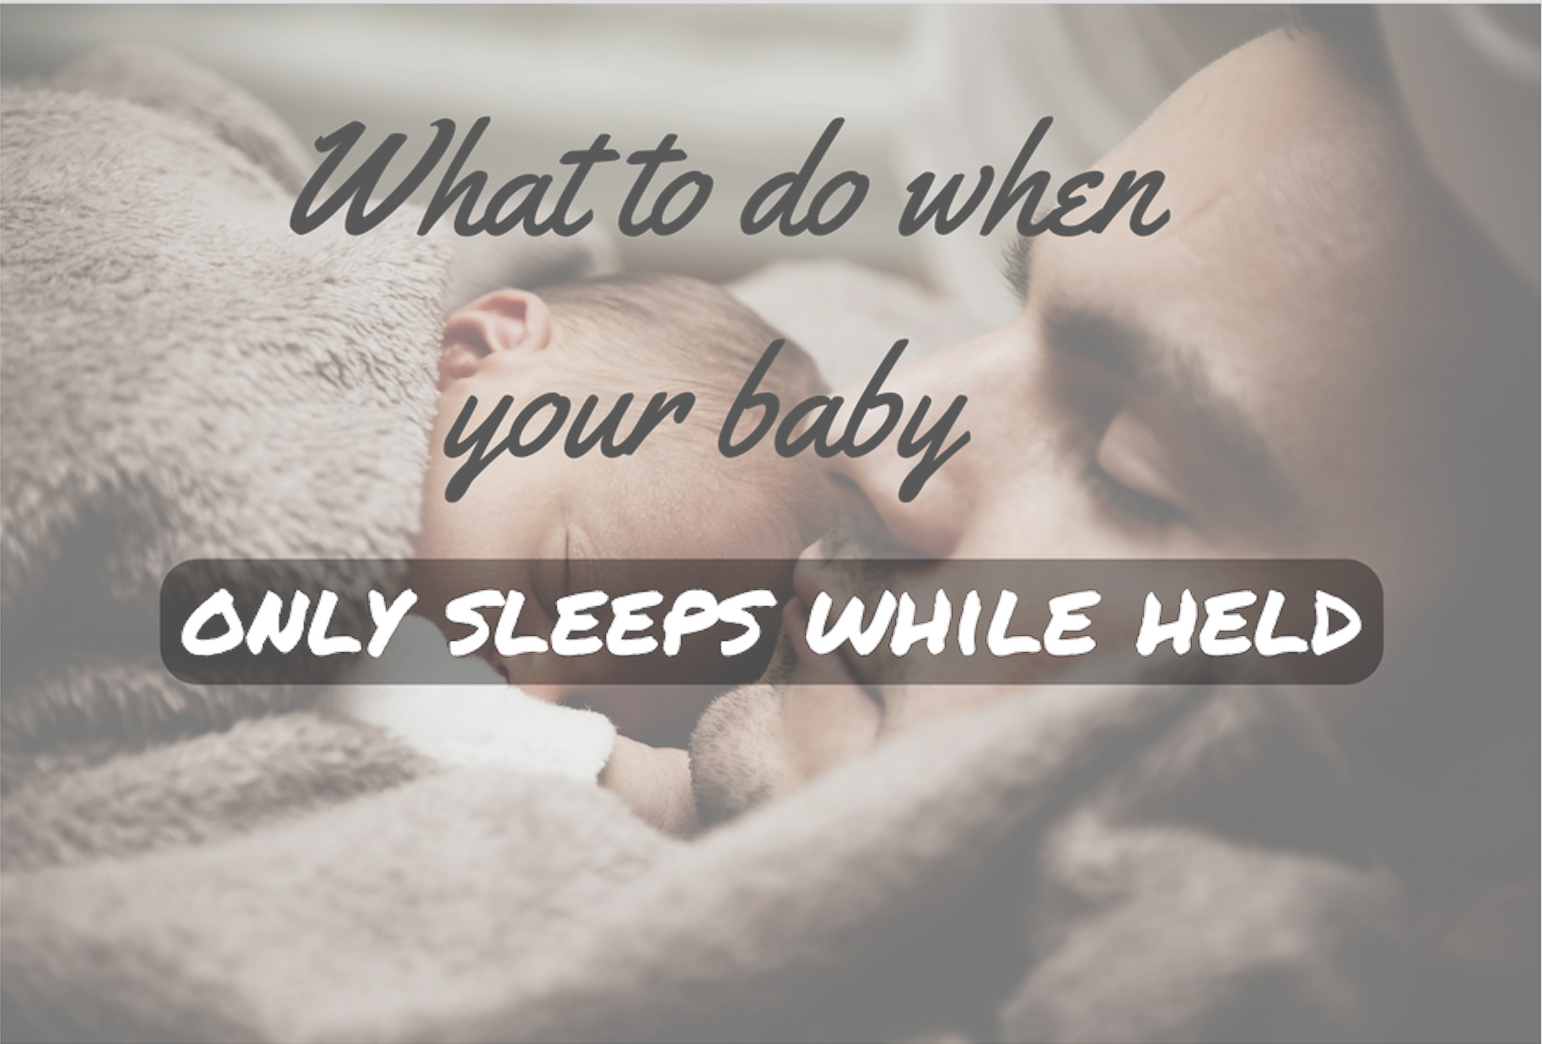 baby only sleeps when held